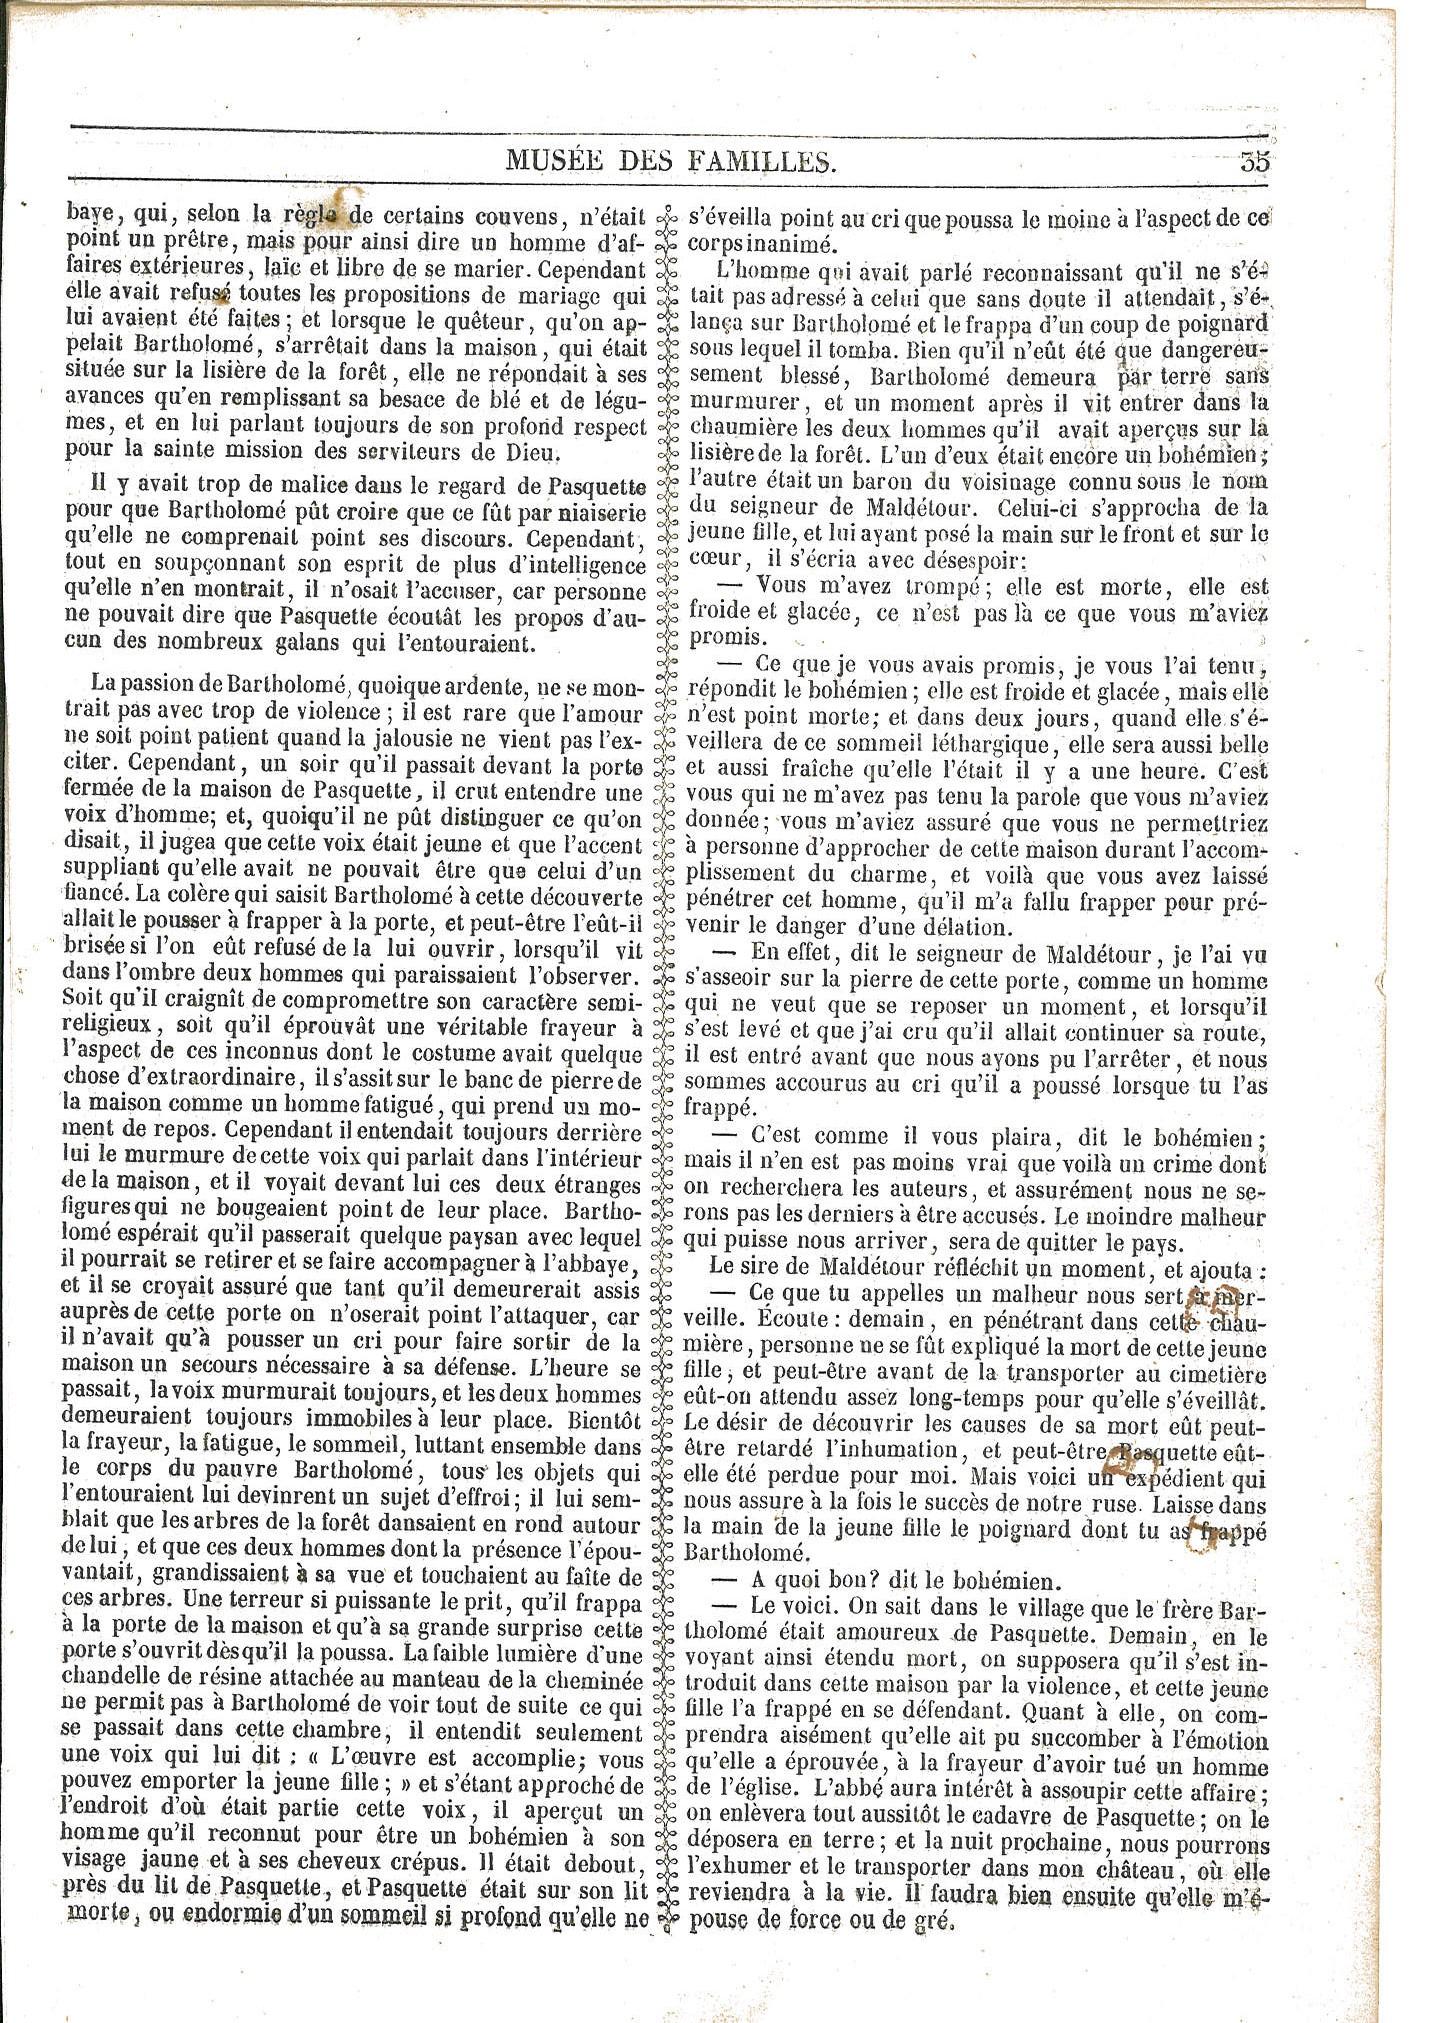 p.35.jpg - image/jpeg